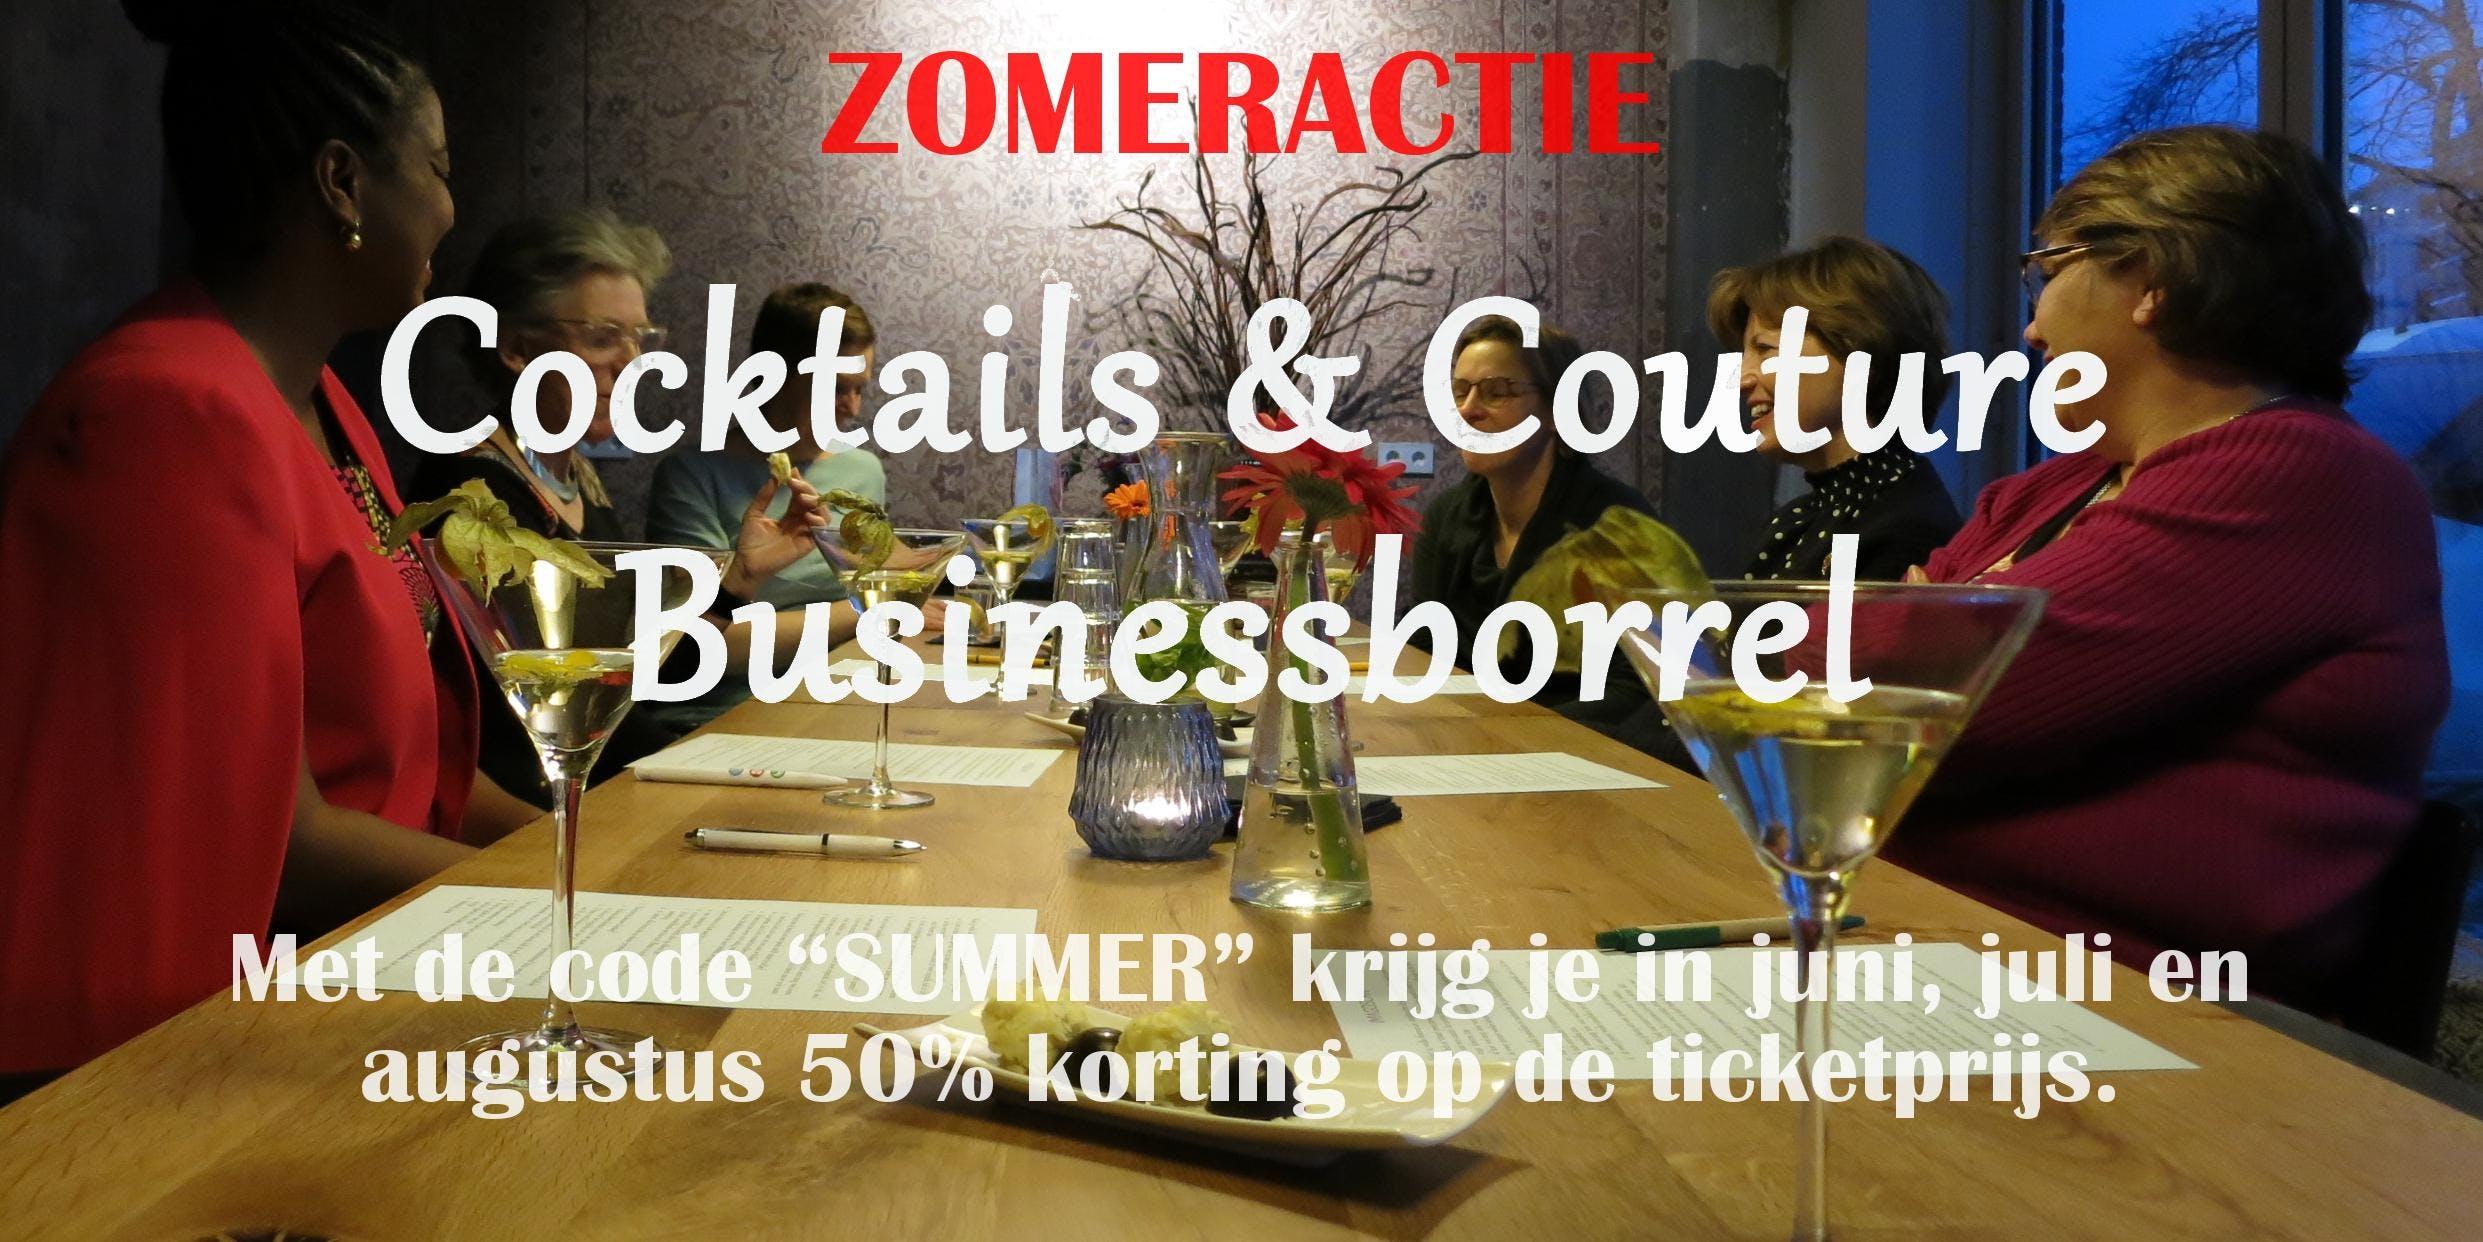 Cocktails & Couture Businessborrel